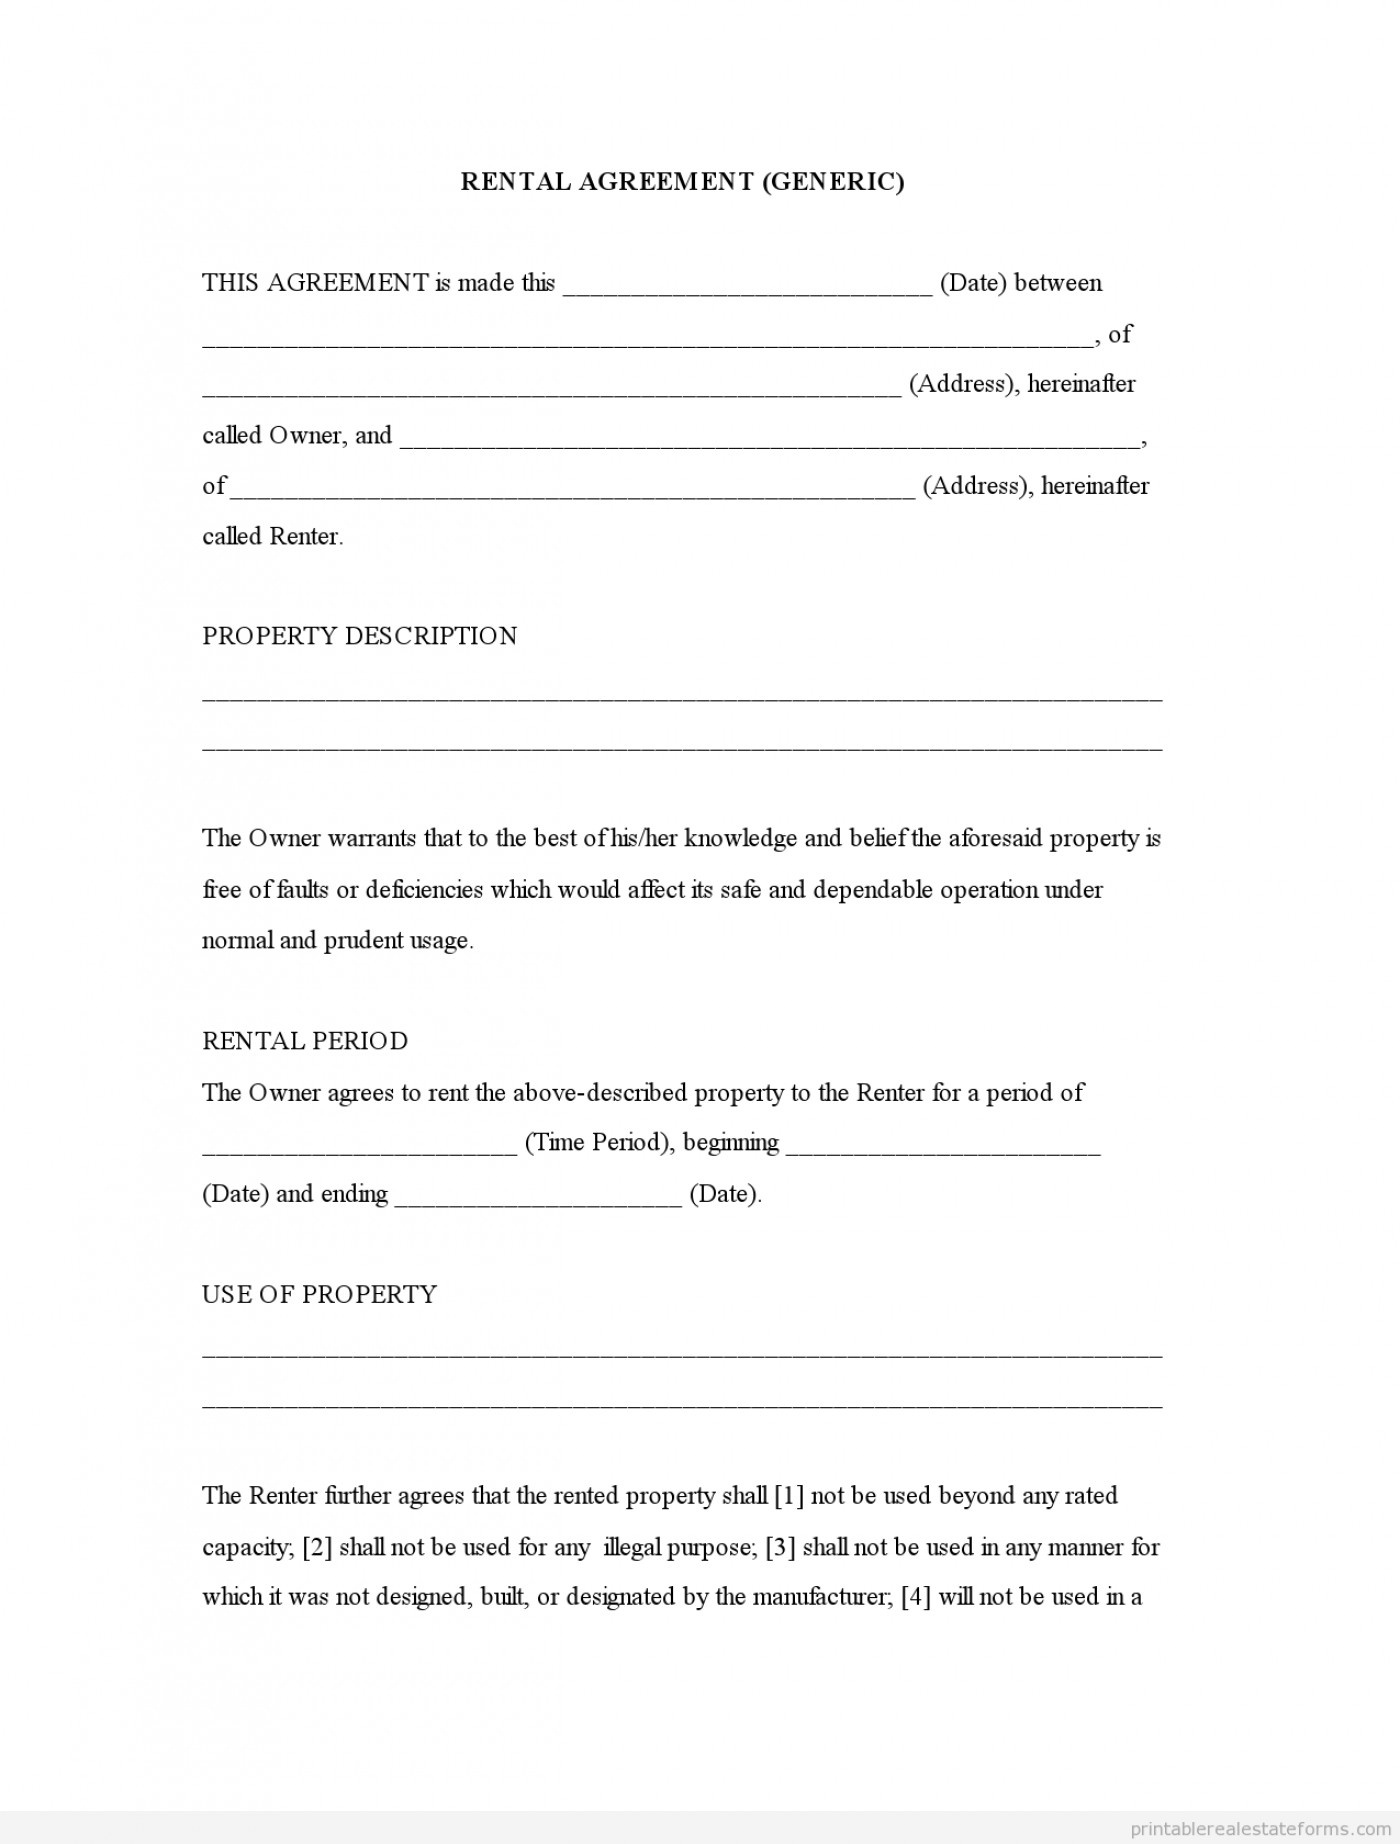 Printable Blank Rental Lease Agreement - Mandanlibrary - Free Printable Rental Agreement